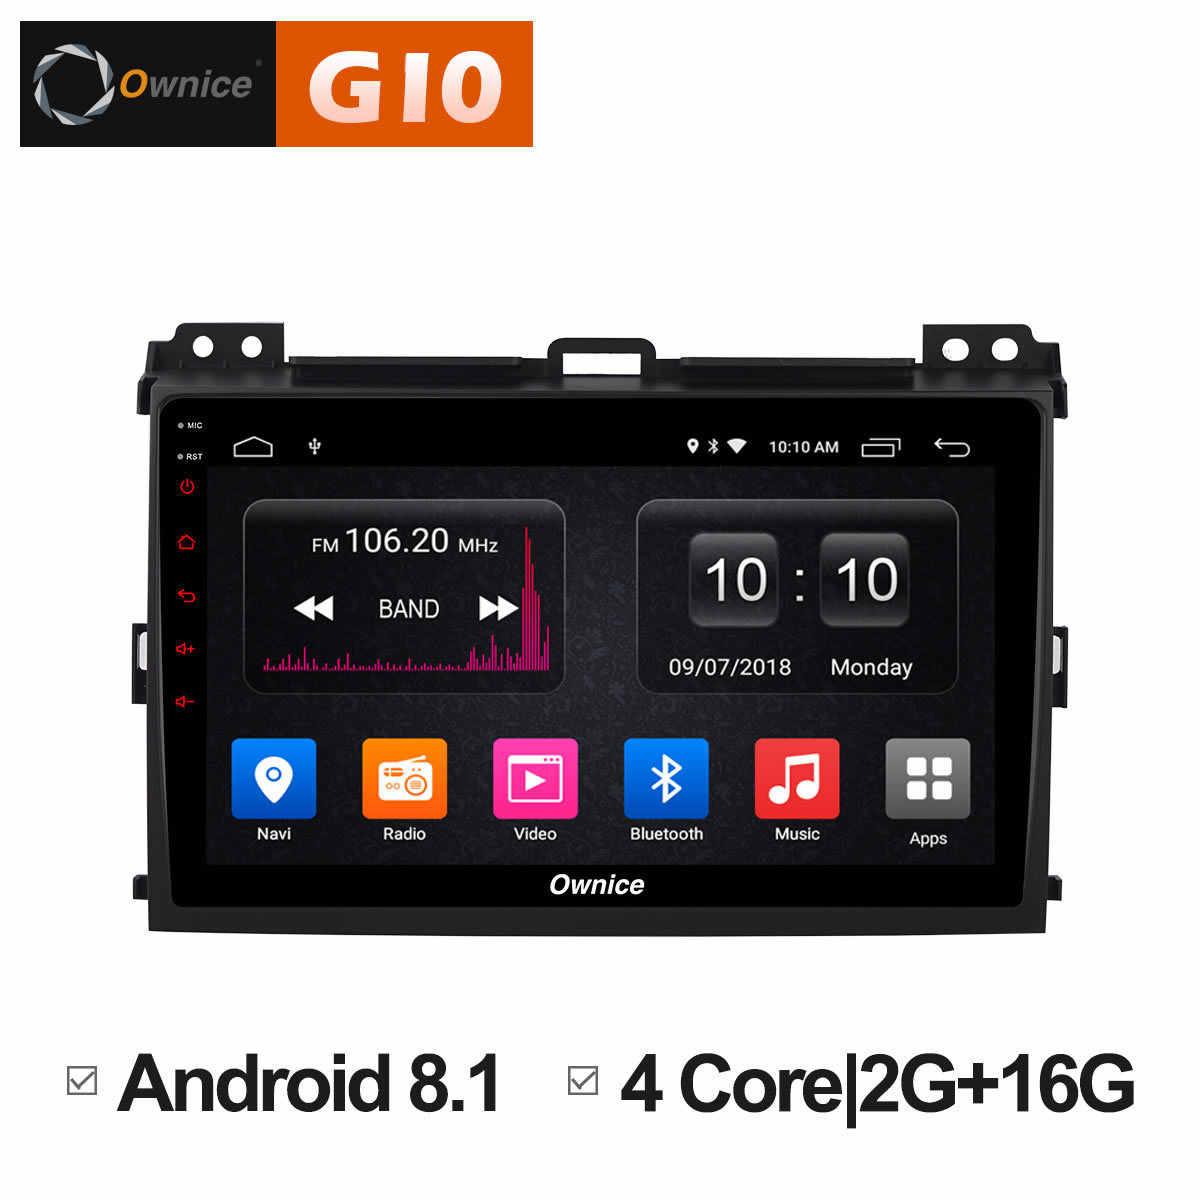 Ownice C500 + G10 Octa Core Android 8.1 Auto DVD GPS Navigatie voor Prado 2004-2009 Land Cruiser 2003 4G LTE DAB + DVR Auto Spelen